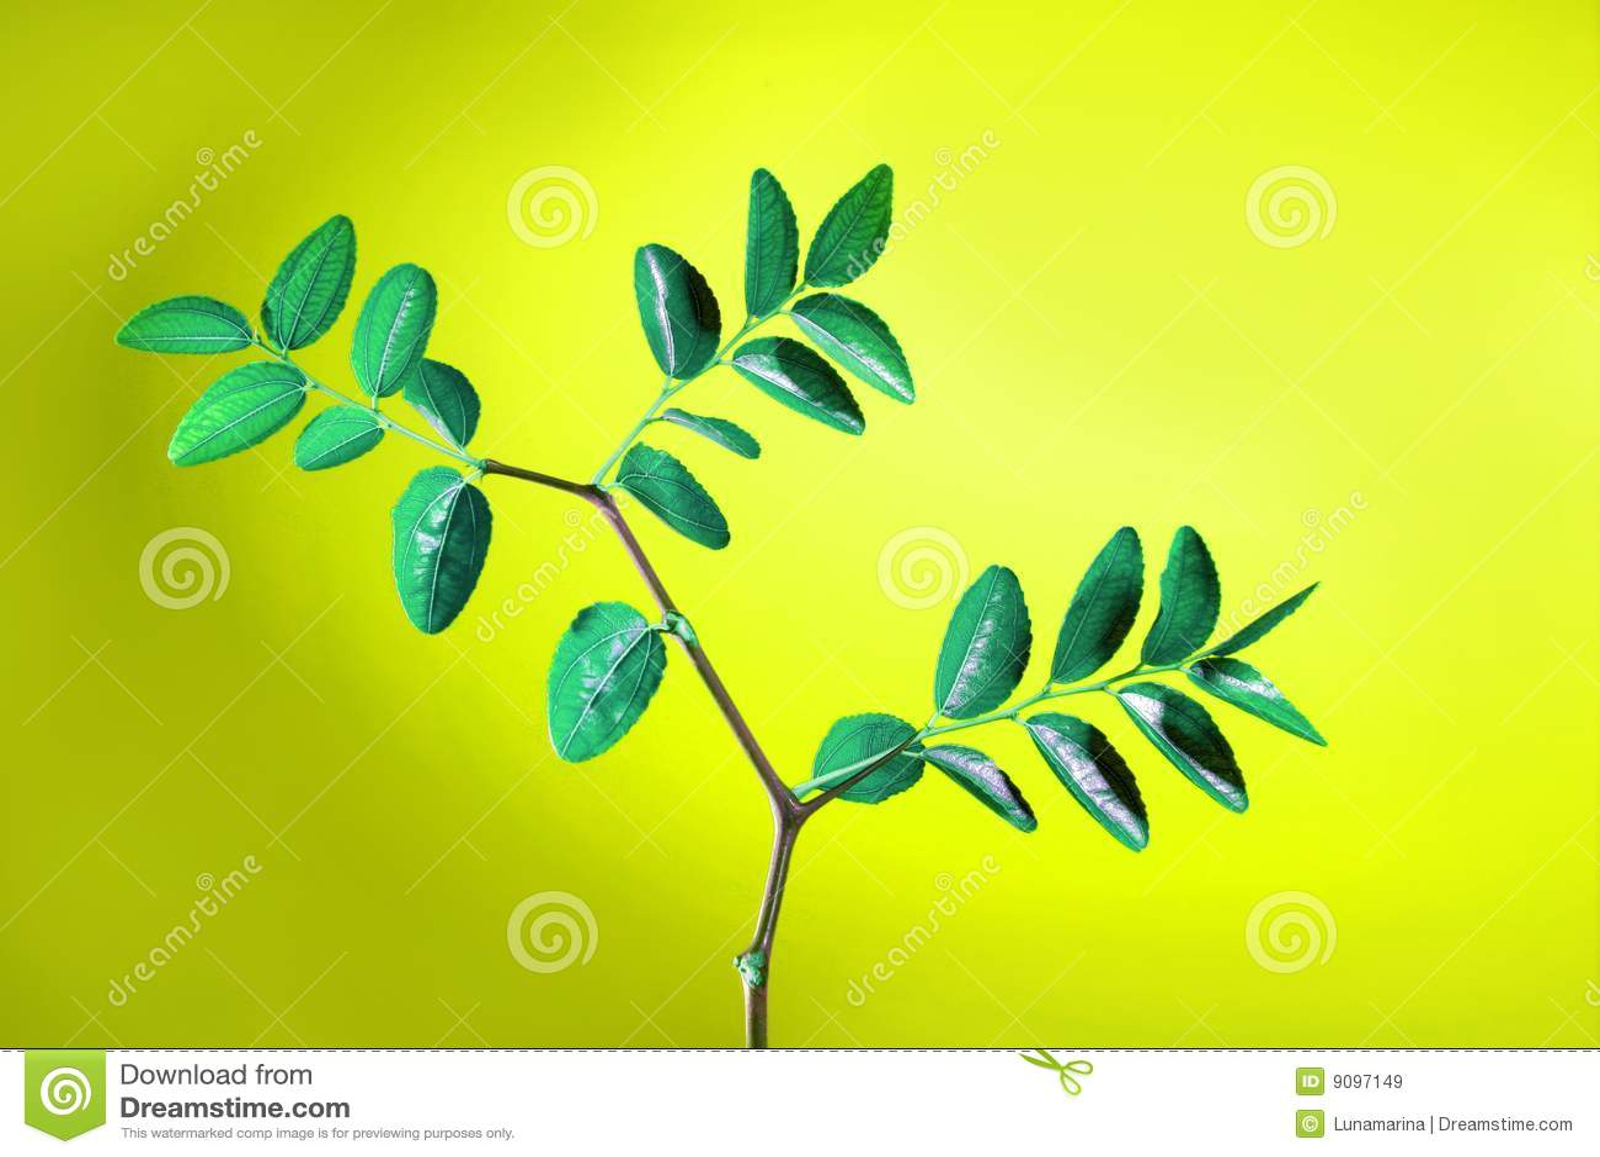 Grünpflanze mit Blattstudioschuß